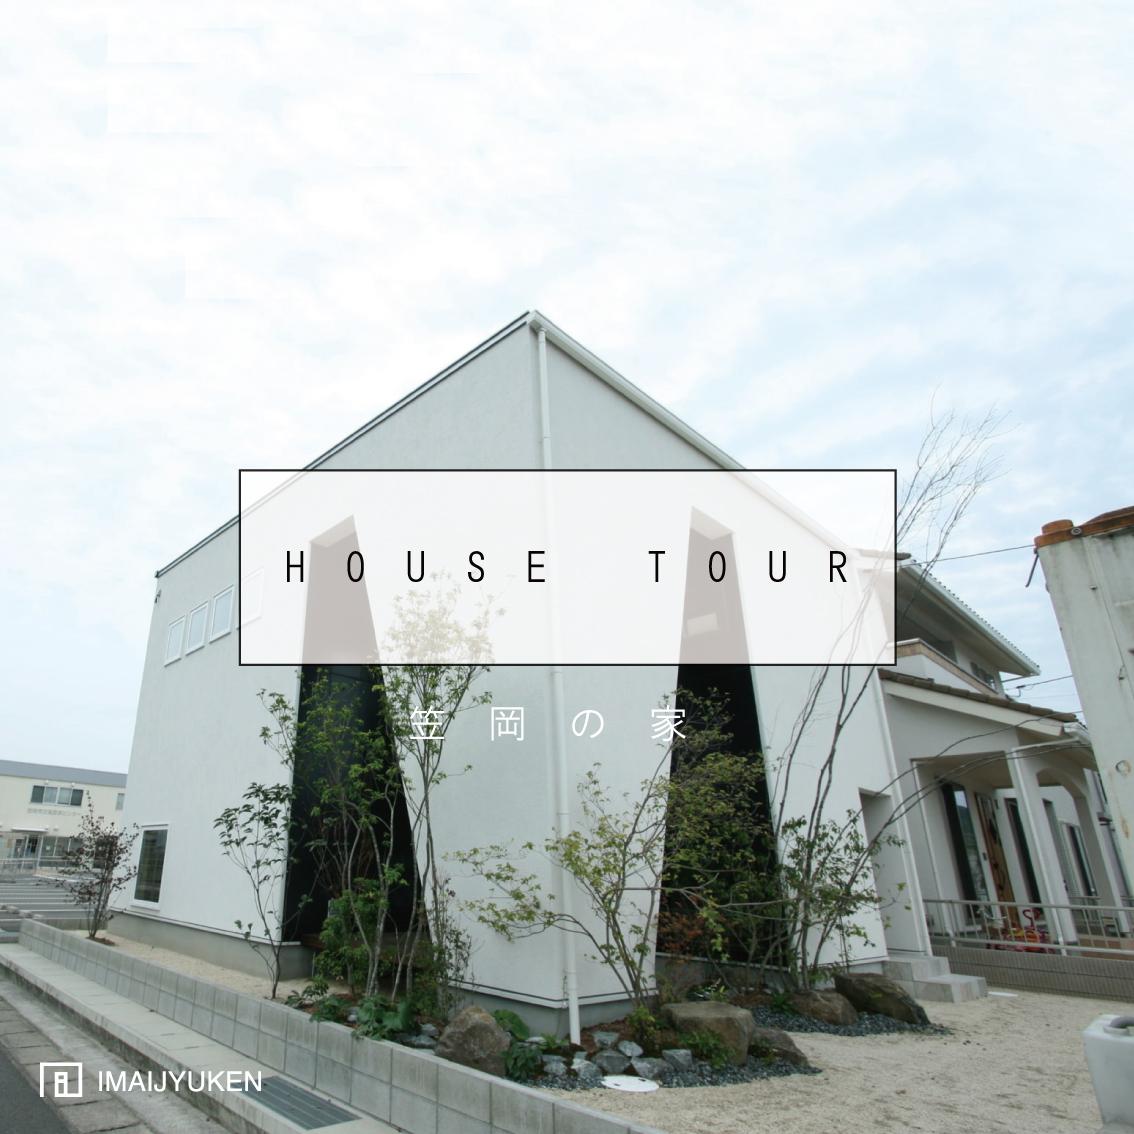 HOUSE TOUR動画(笠岡の家)をアップしました!